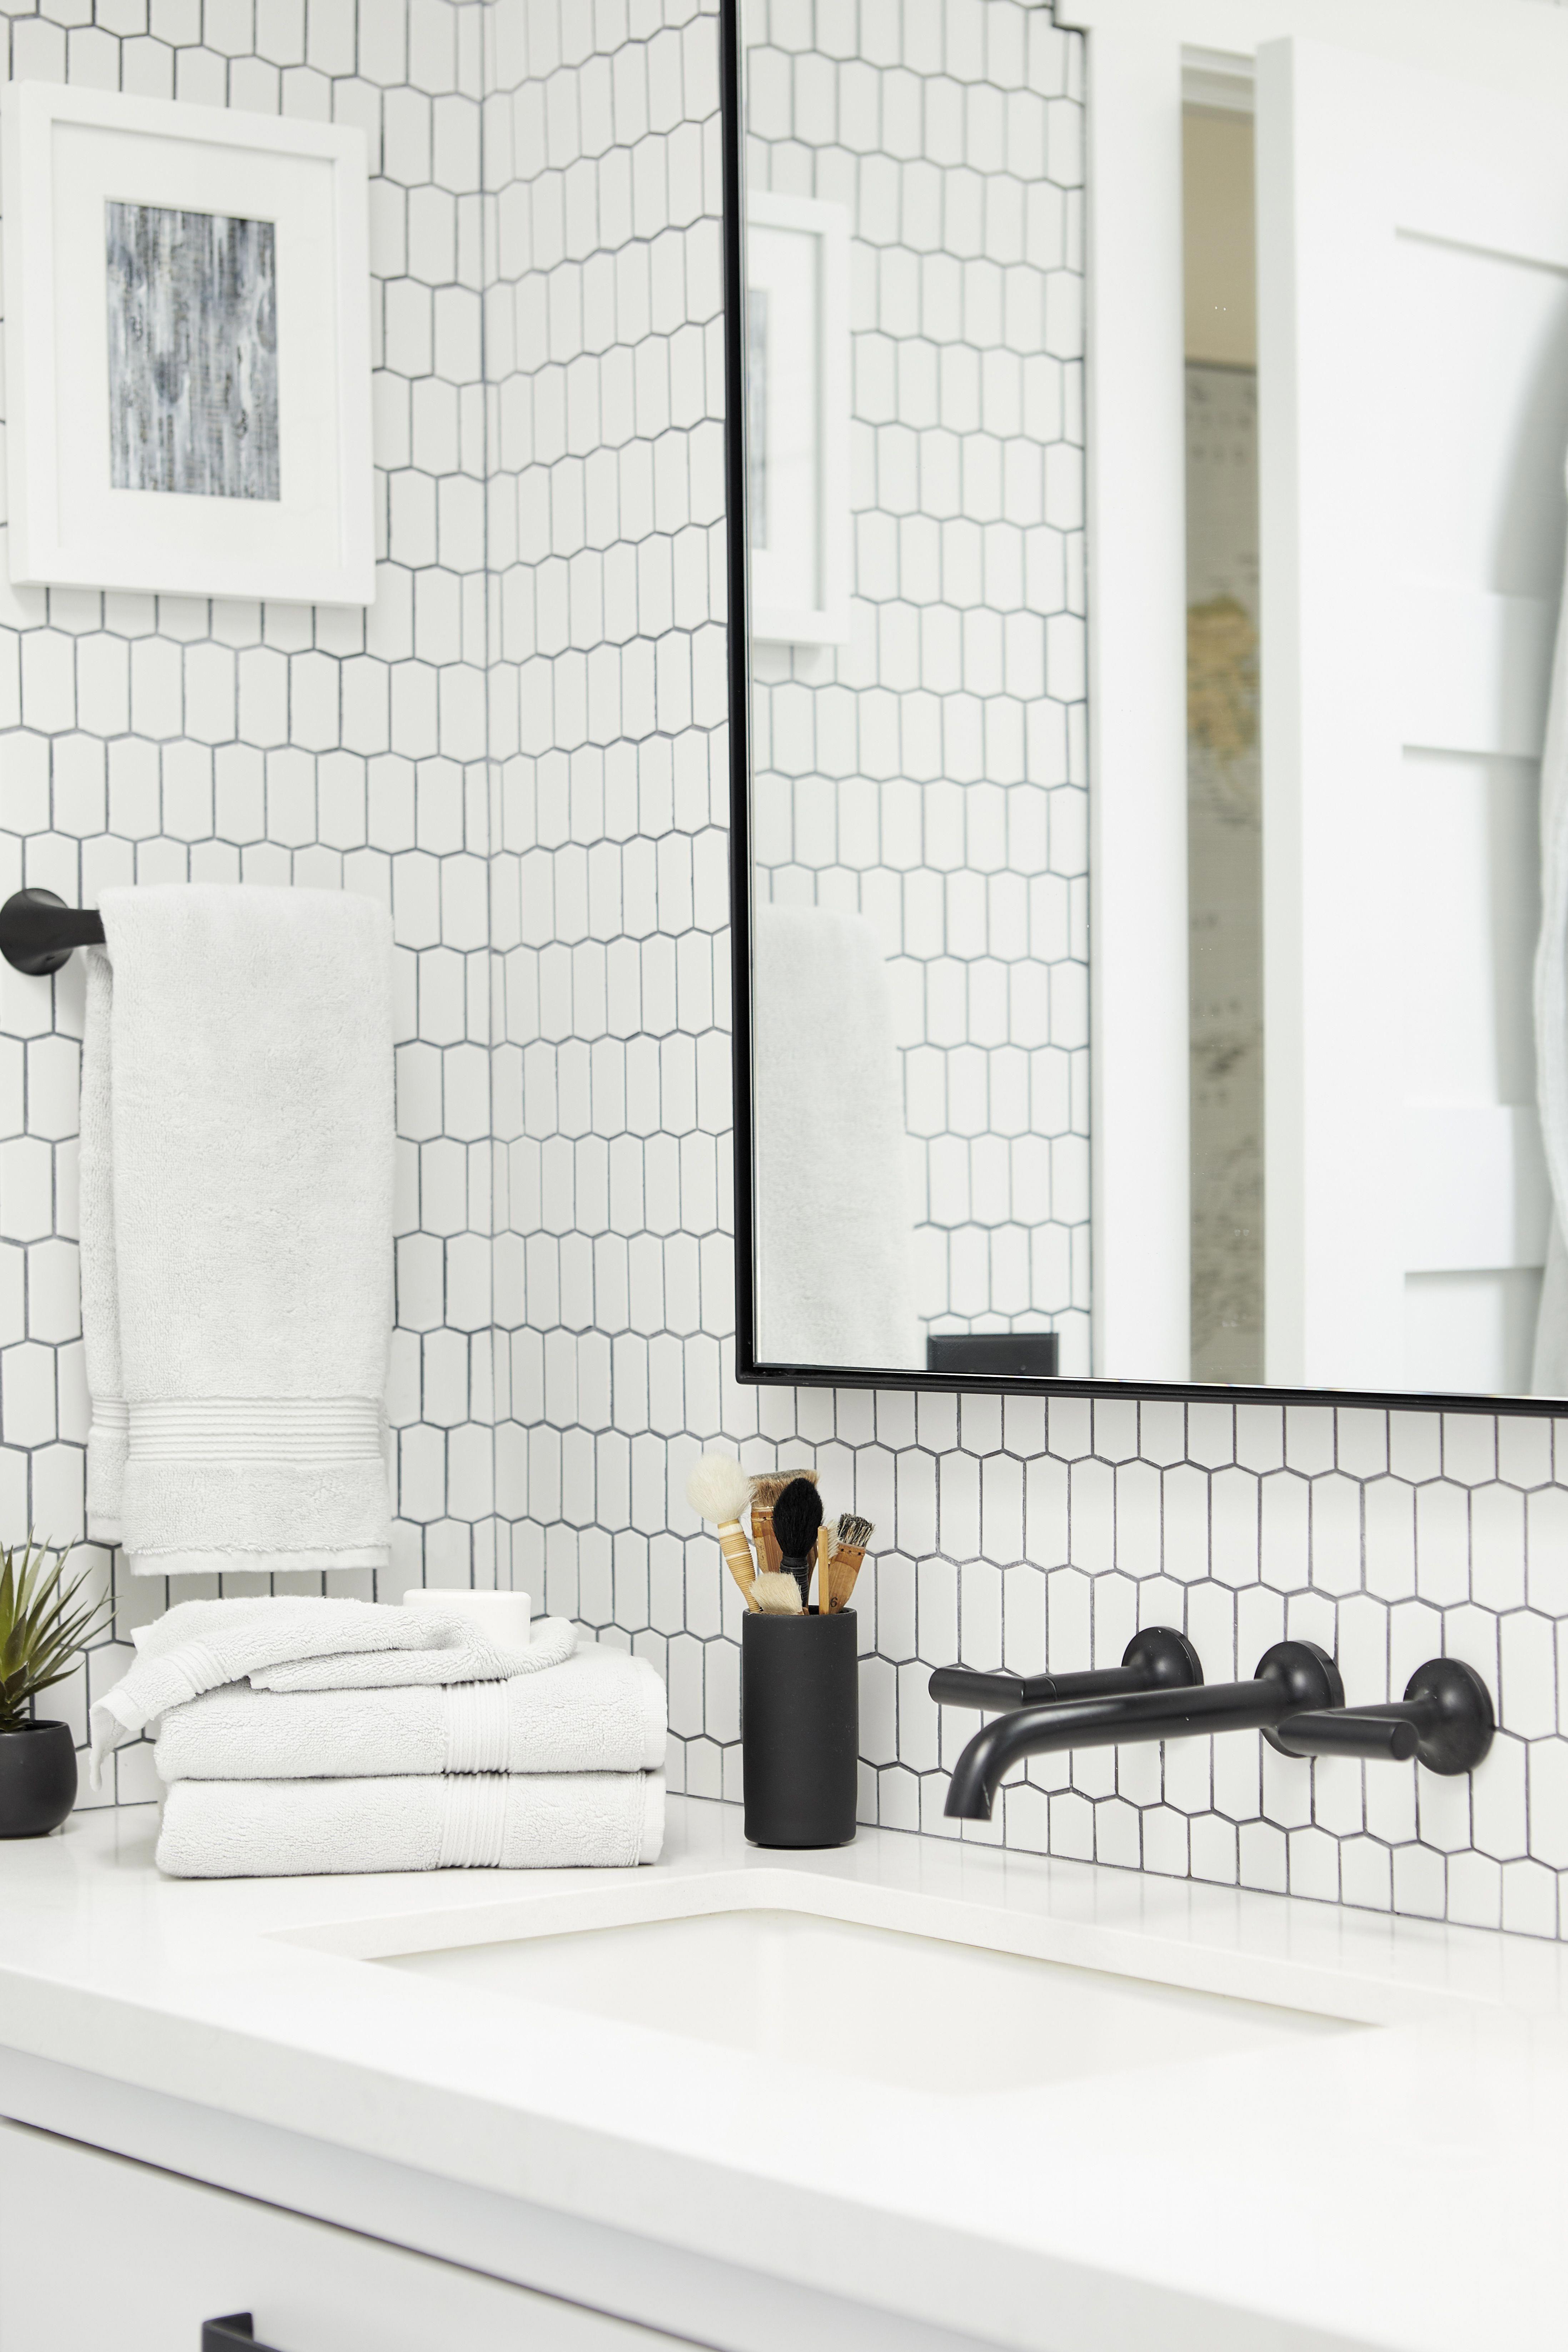 7 Amazing Black And White Bathroom Cozy Decoration Home Morden Tile Bathroom Black Bathroom Bathroom Interior Design